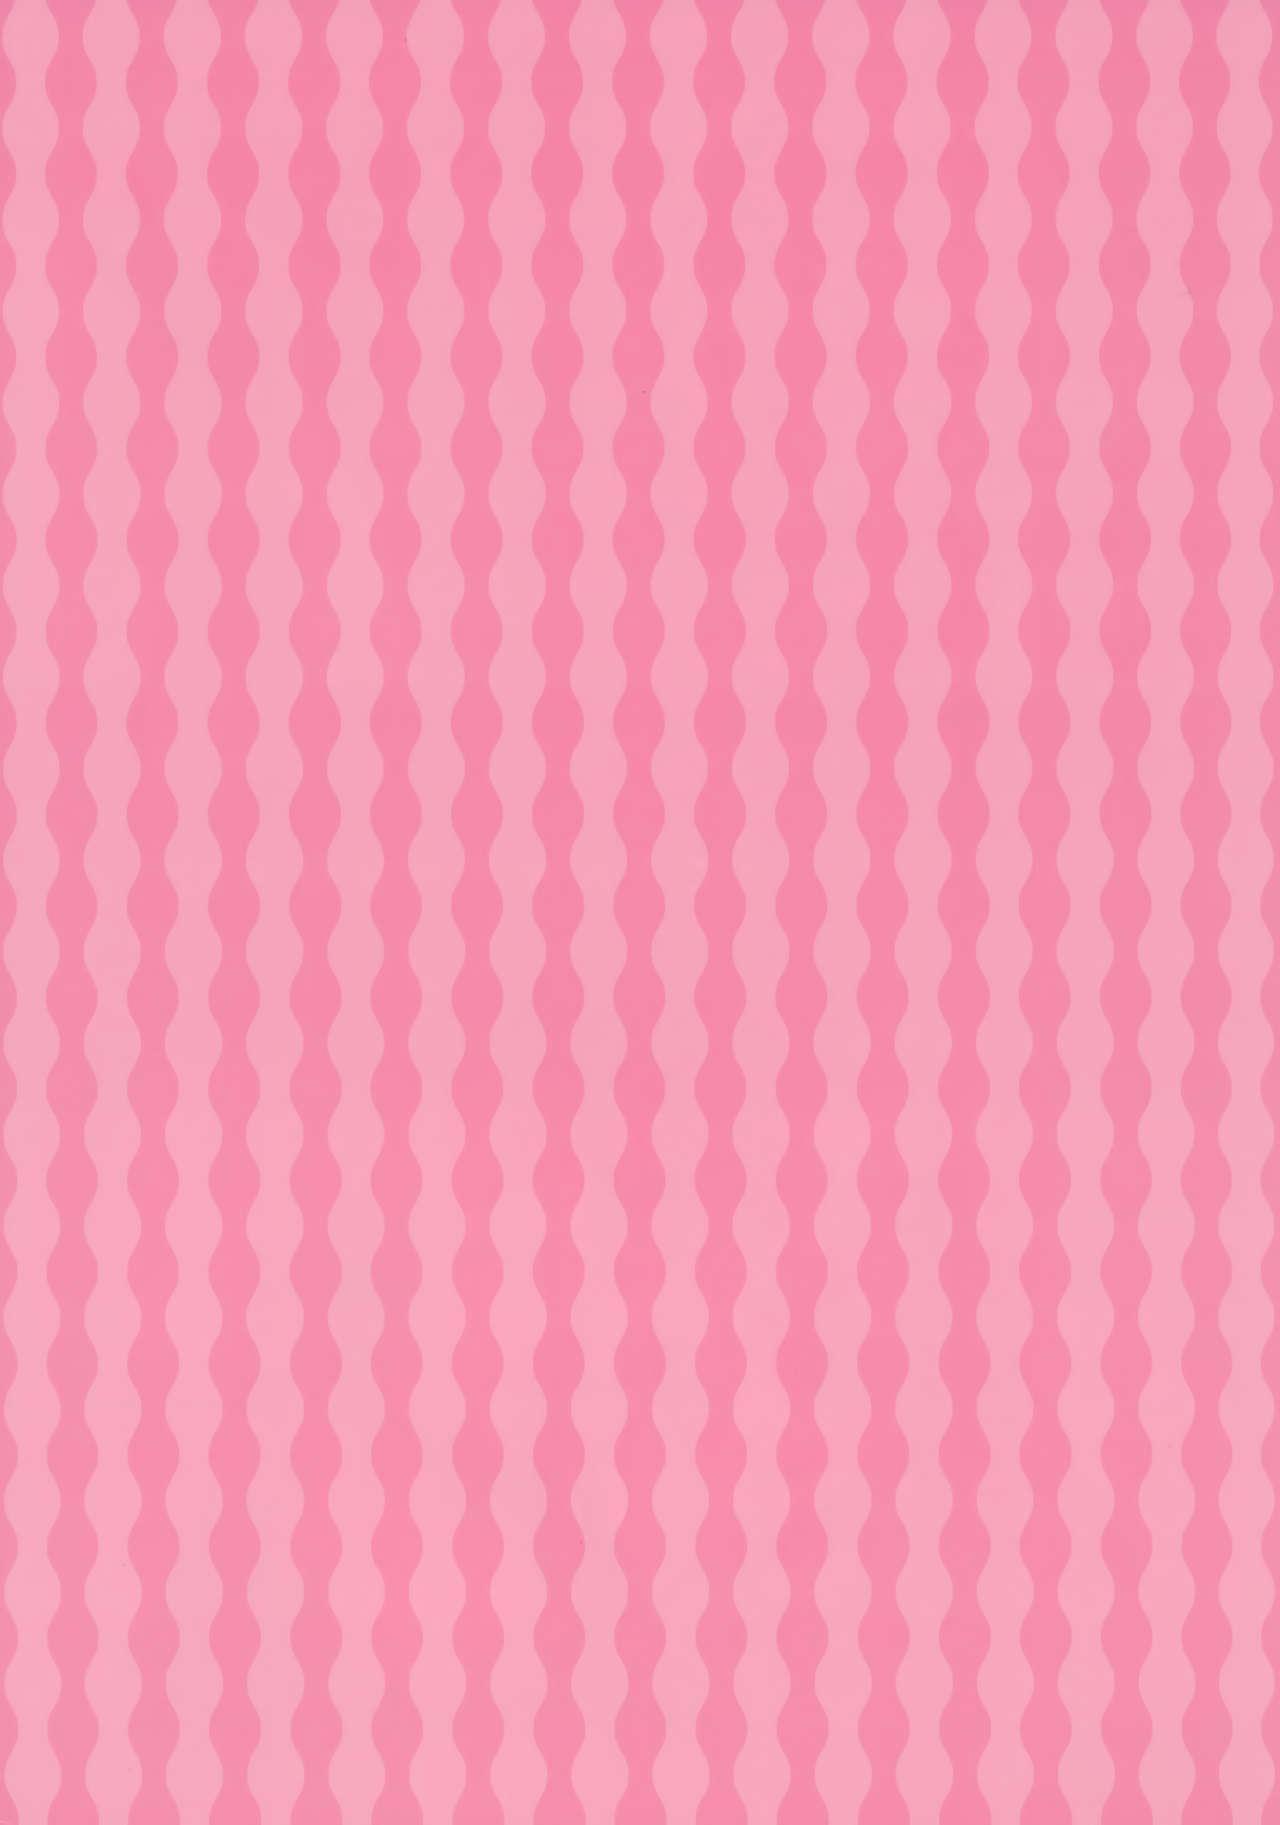 ORDER*MAID*SISTERS Jougasaki Shimai to Maid SEX Suru Hon 3